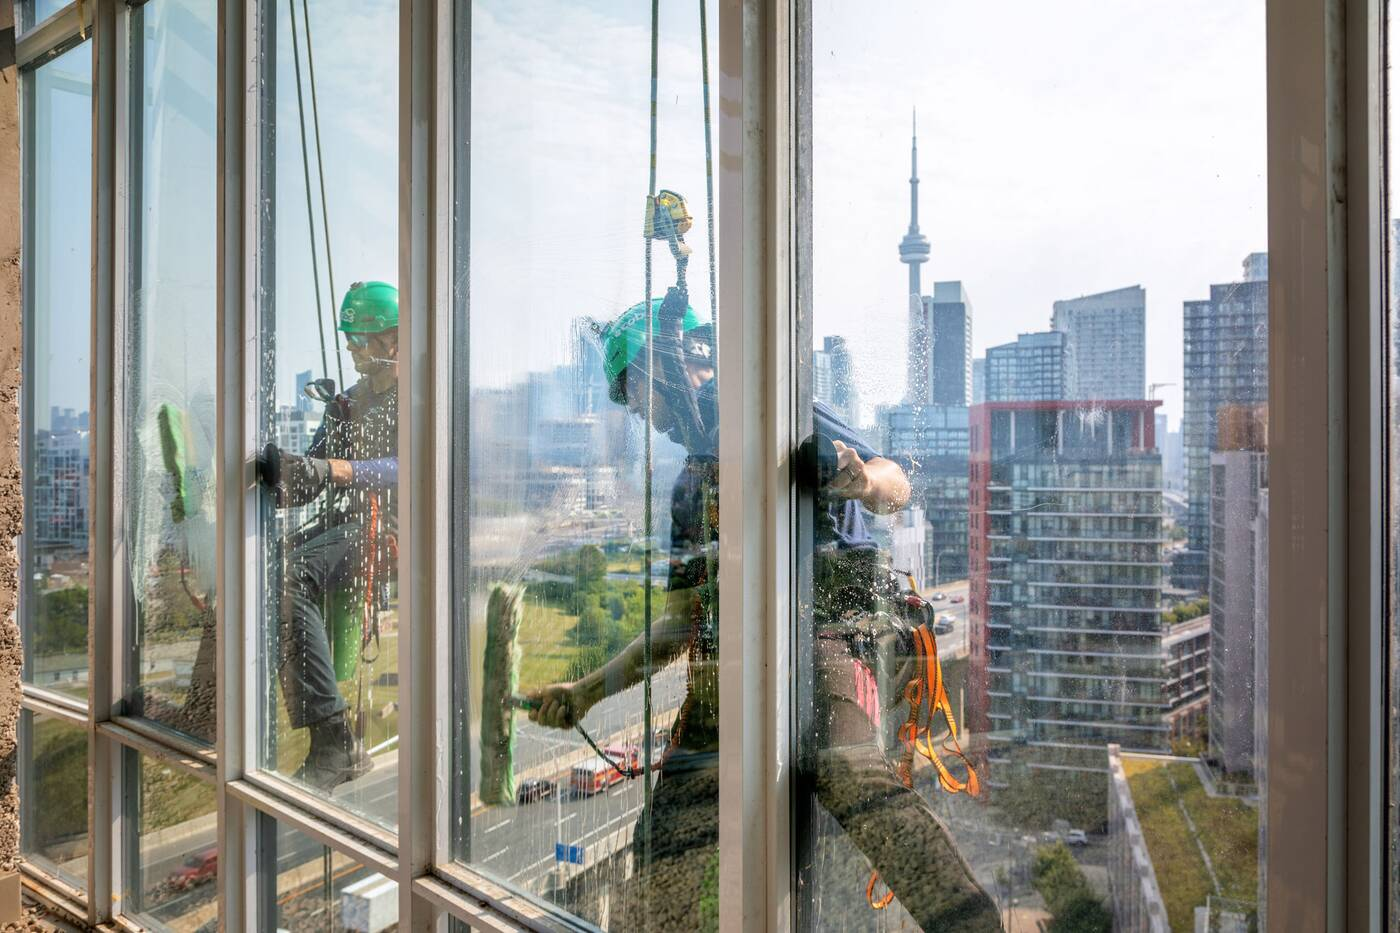 toronto window cleaner view